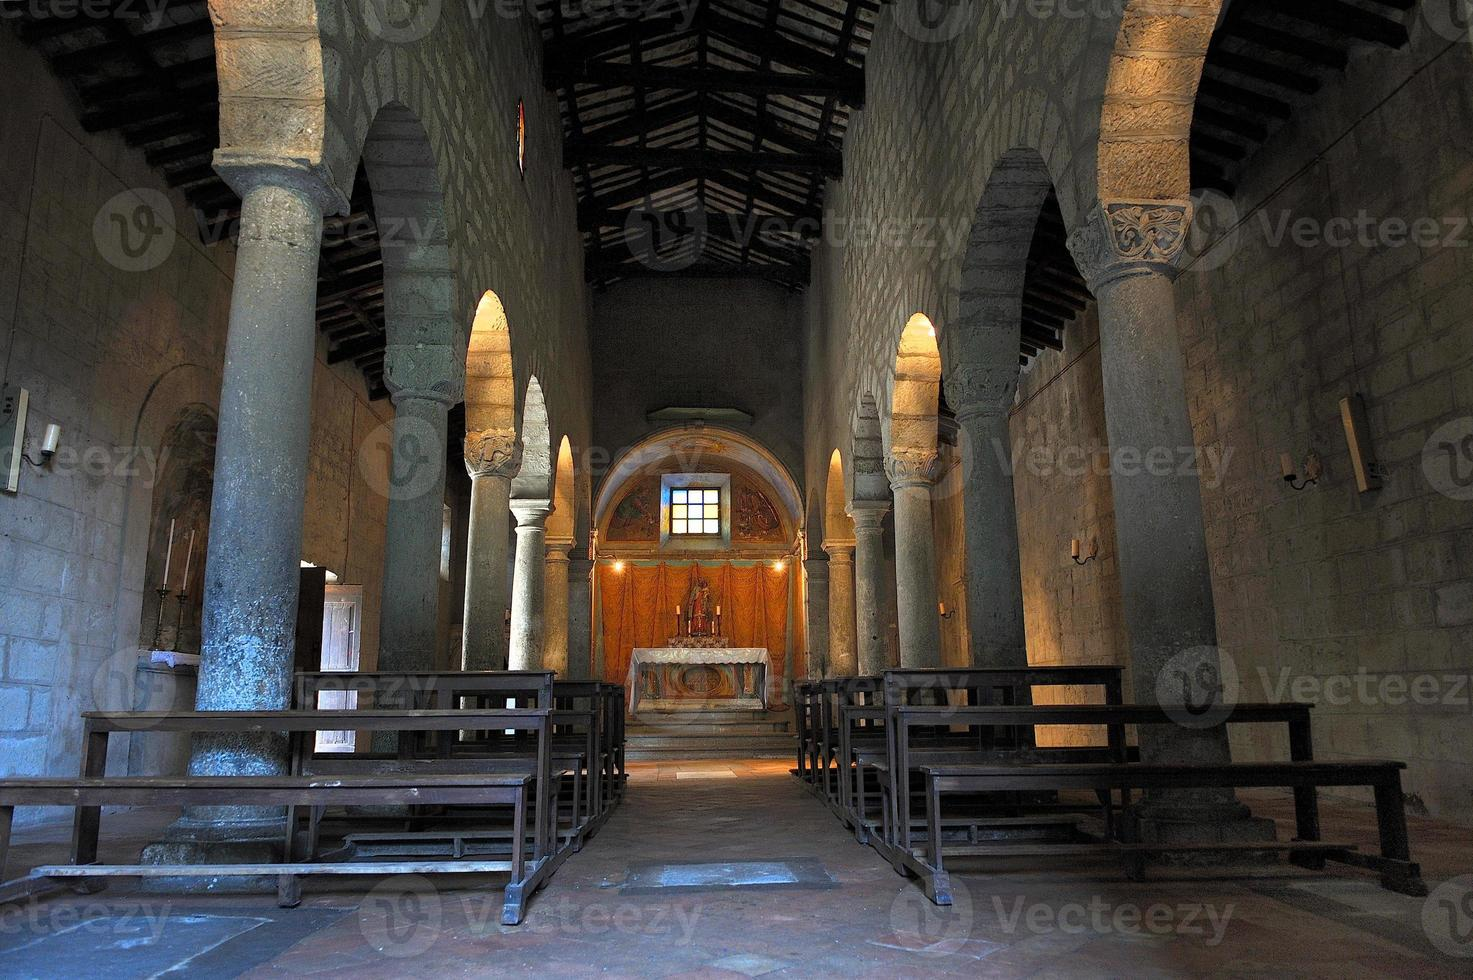 antigua iglesia interior foto